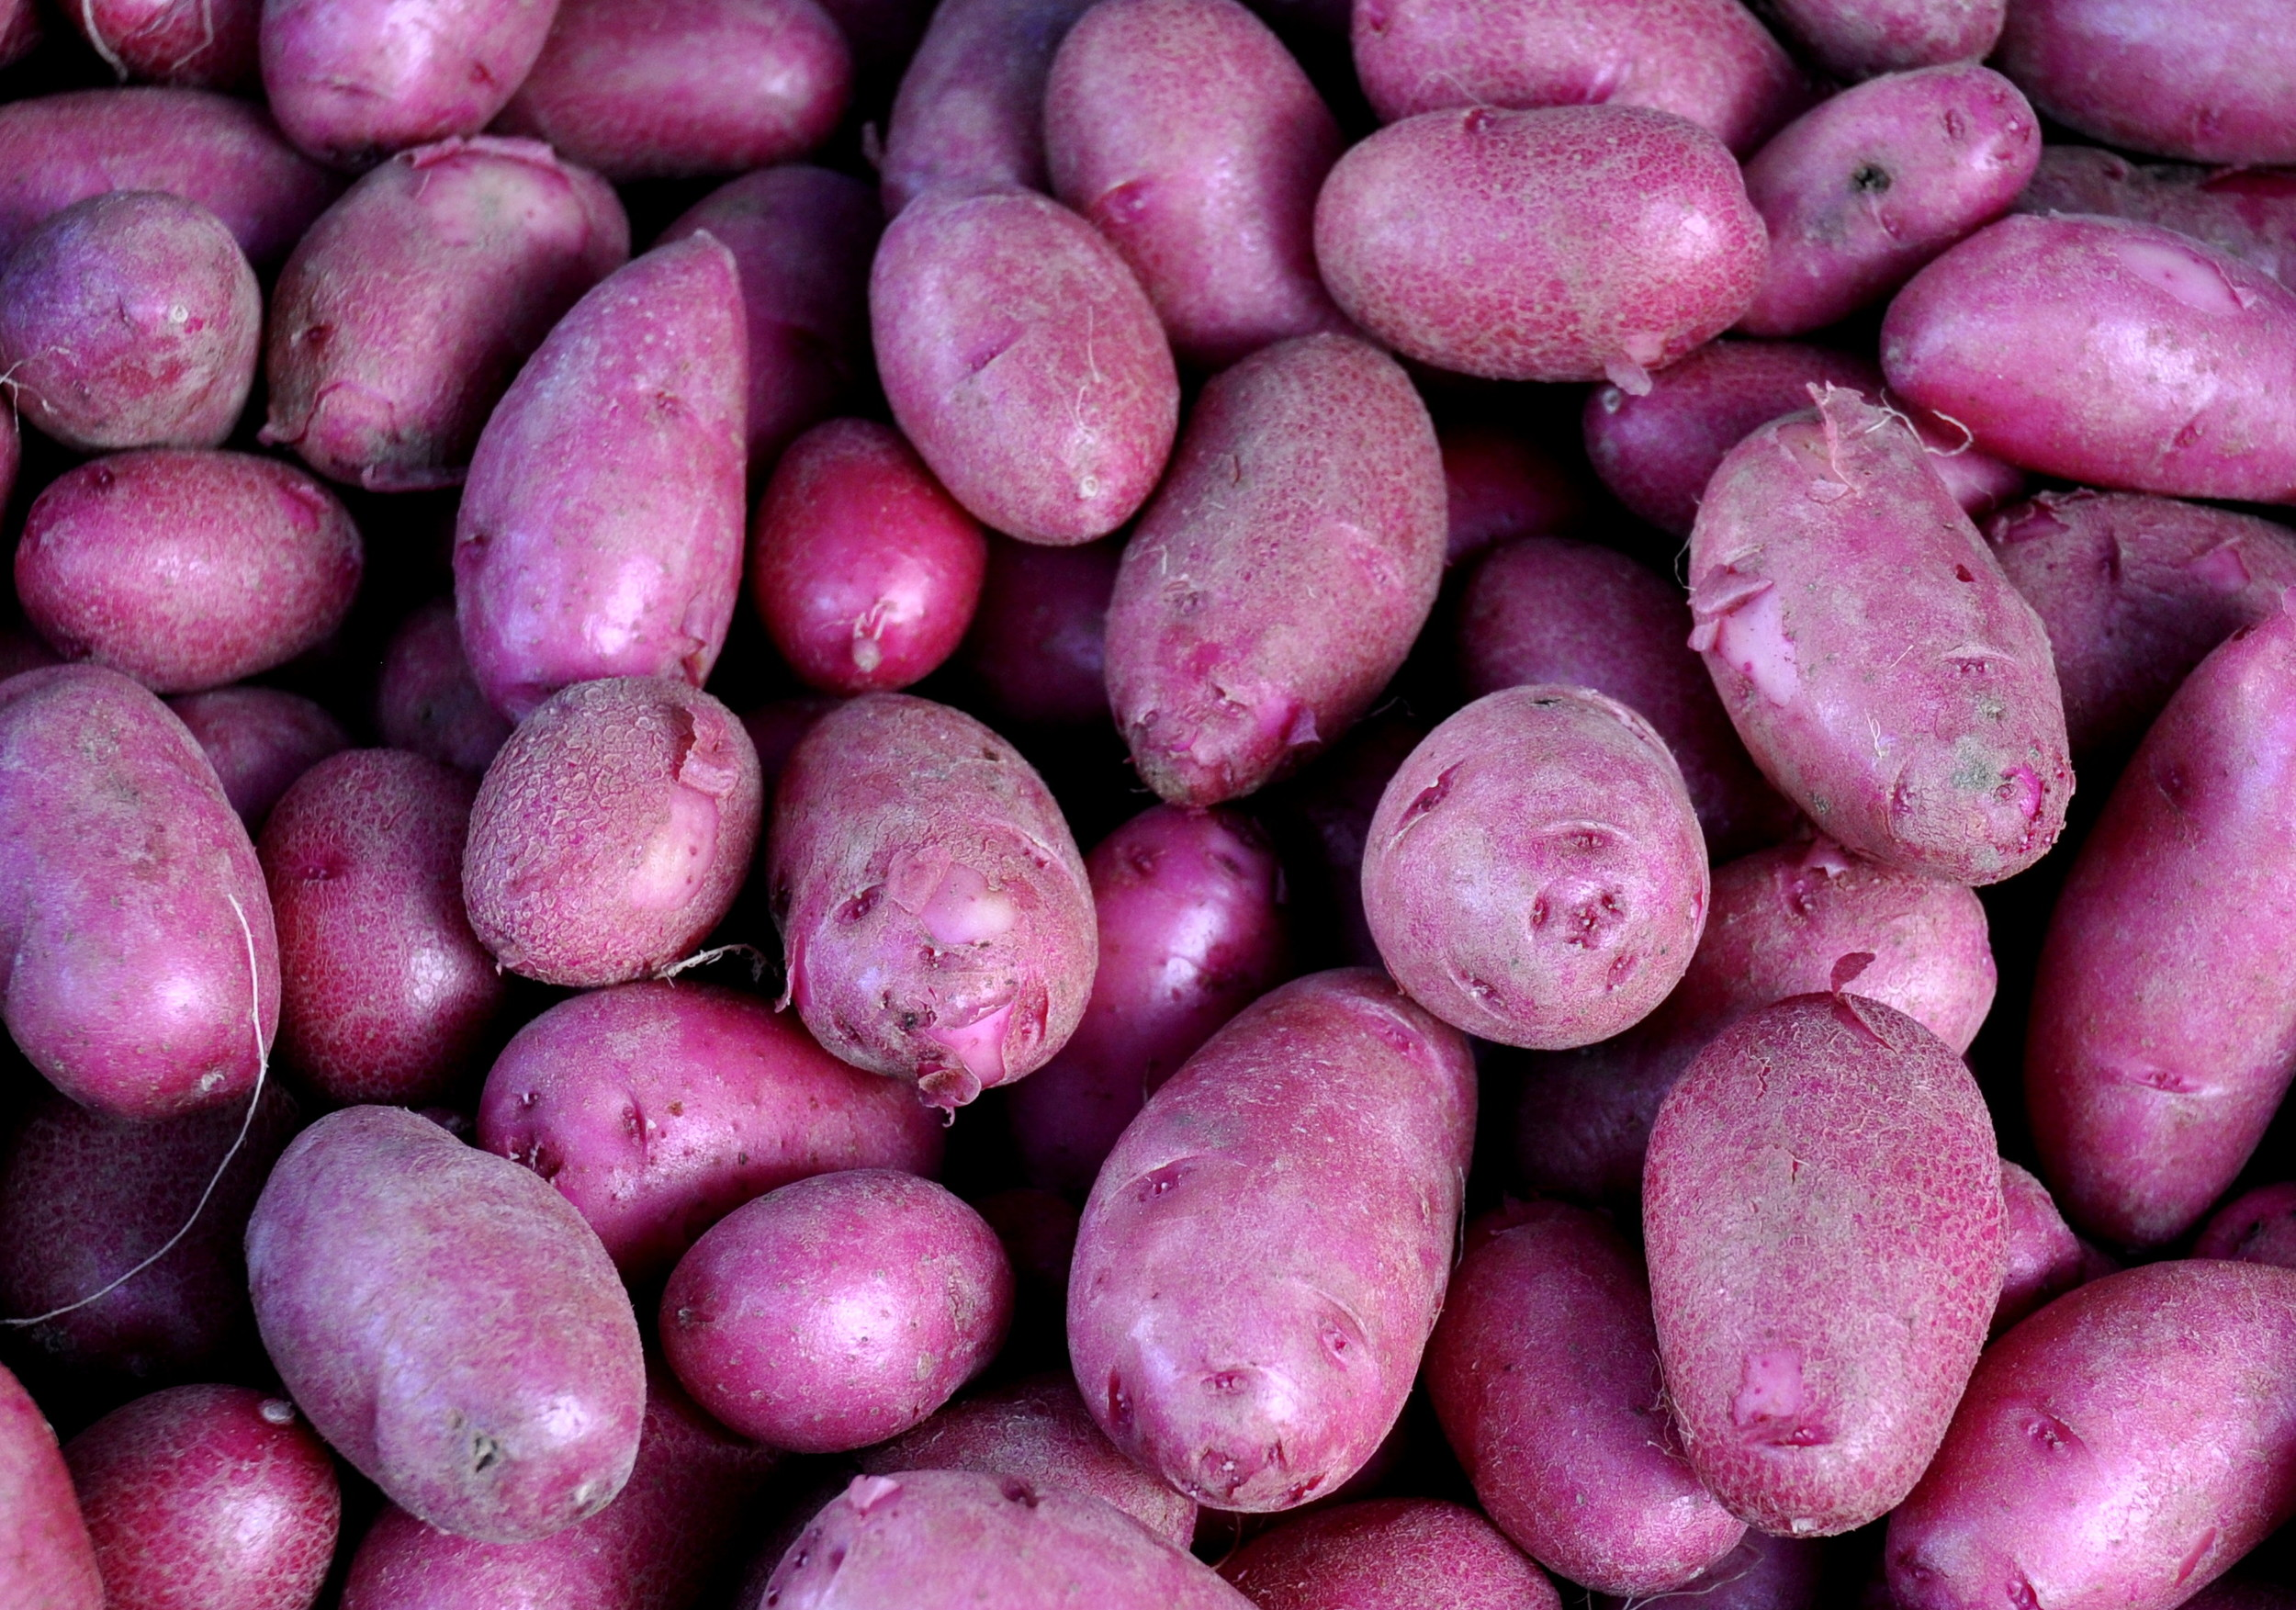 Red thumb new potatoes from Alvarez Organic Farms.. Photo copyright 2014 by Zachary D. Lyons.